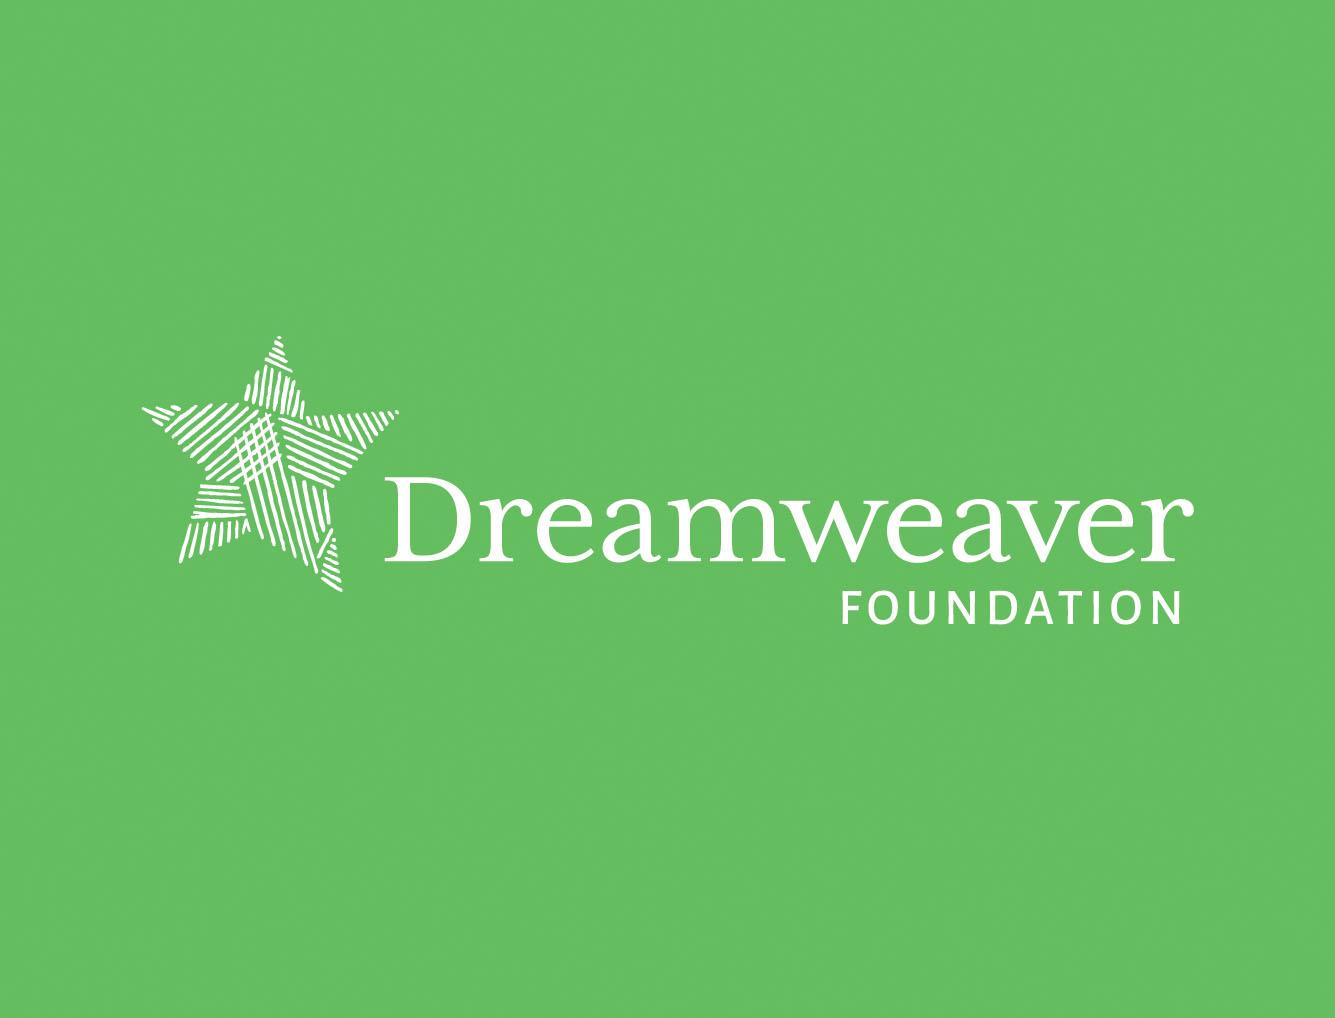 Dreamweaver Foundation